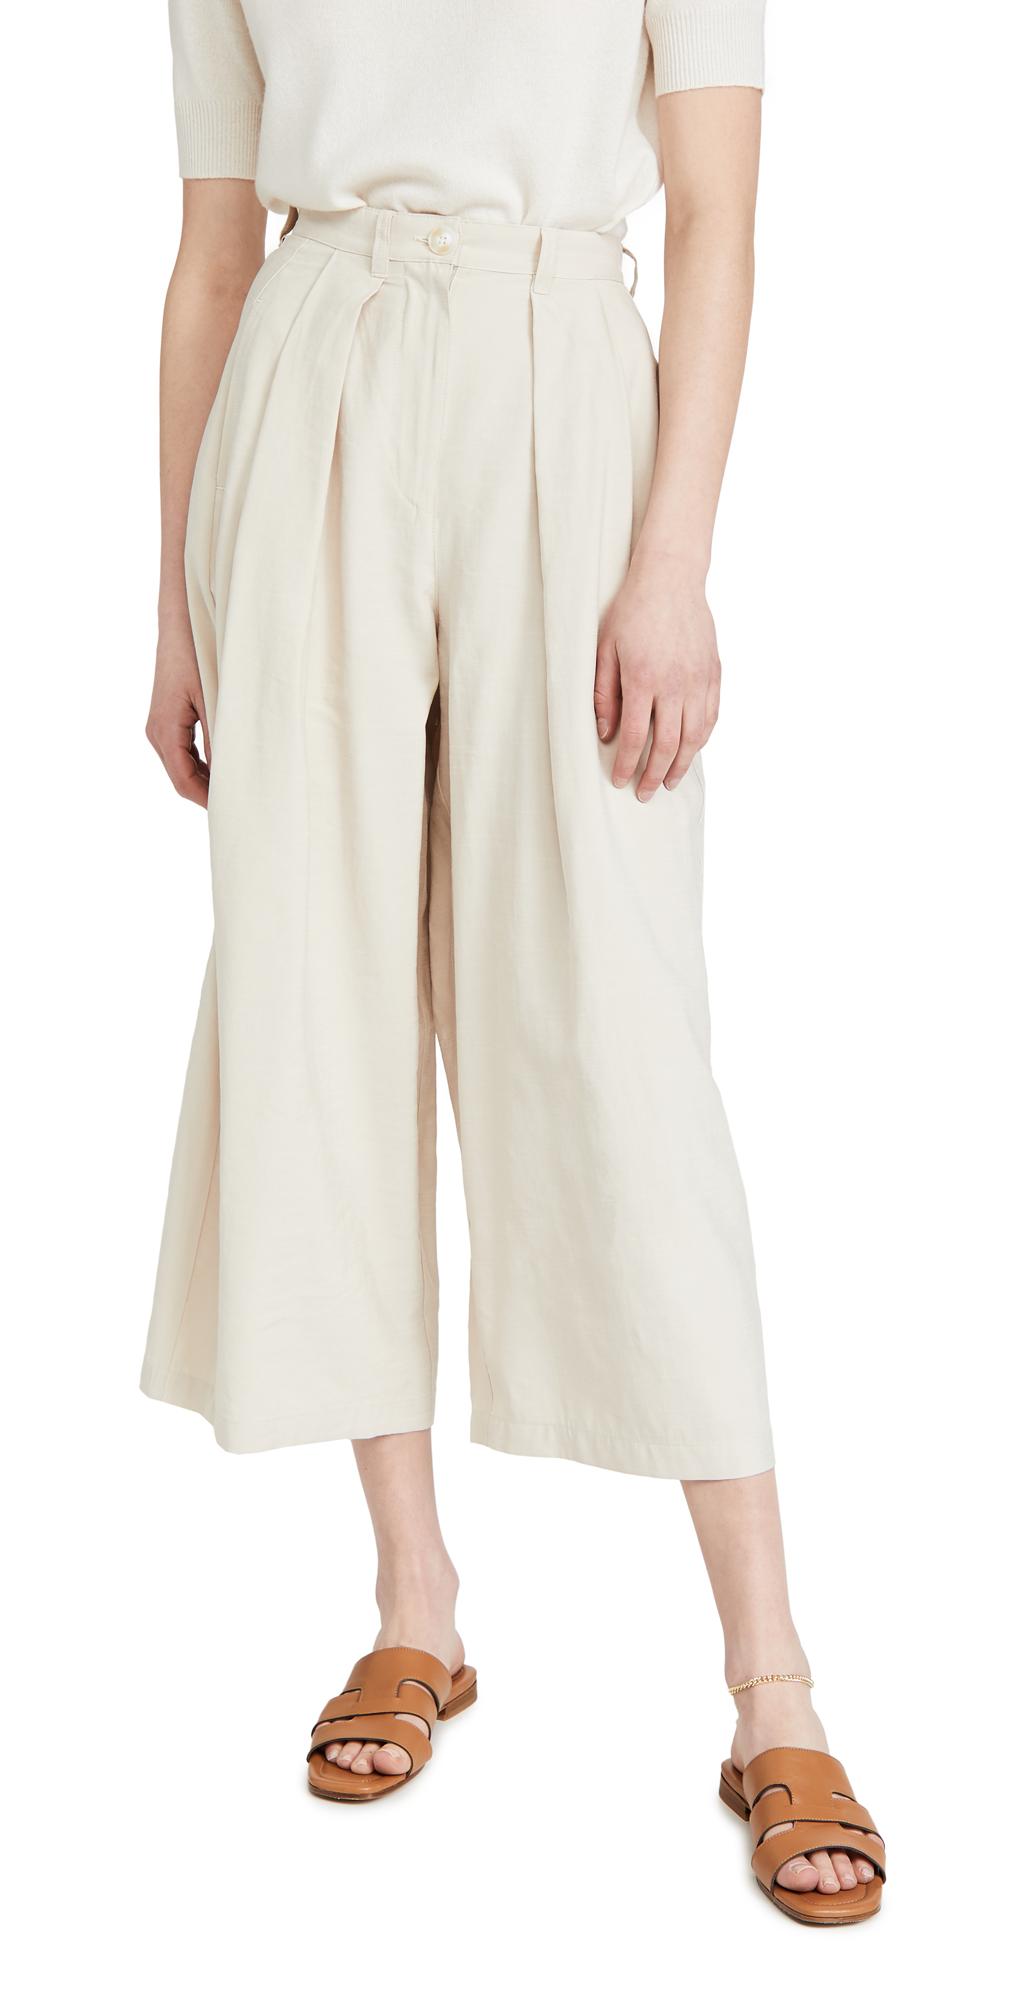 Meadows Sanne Trousers